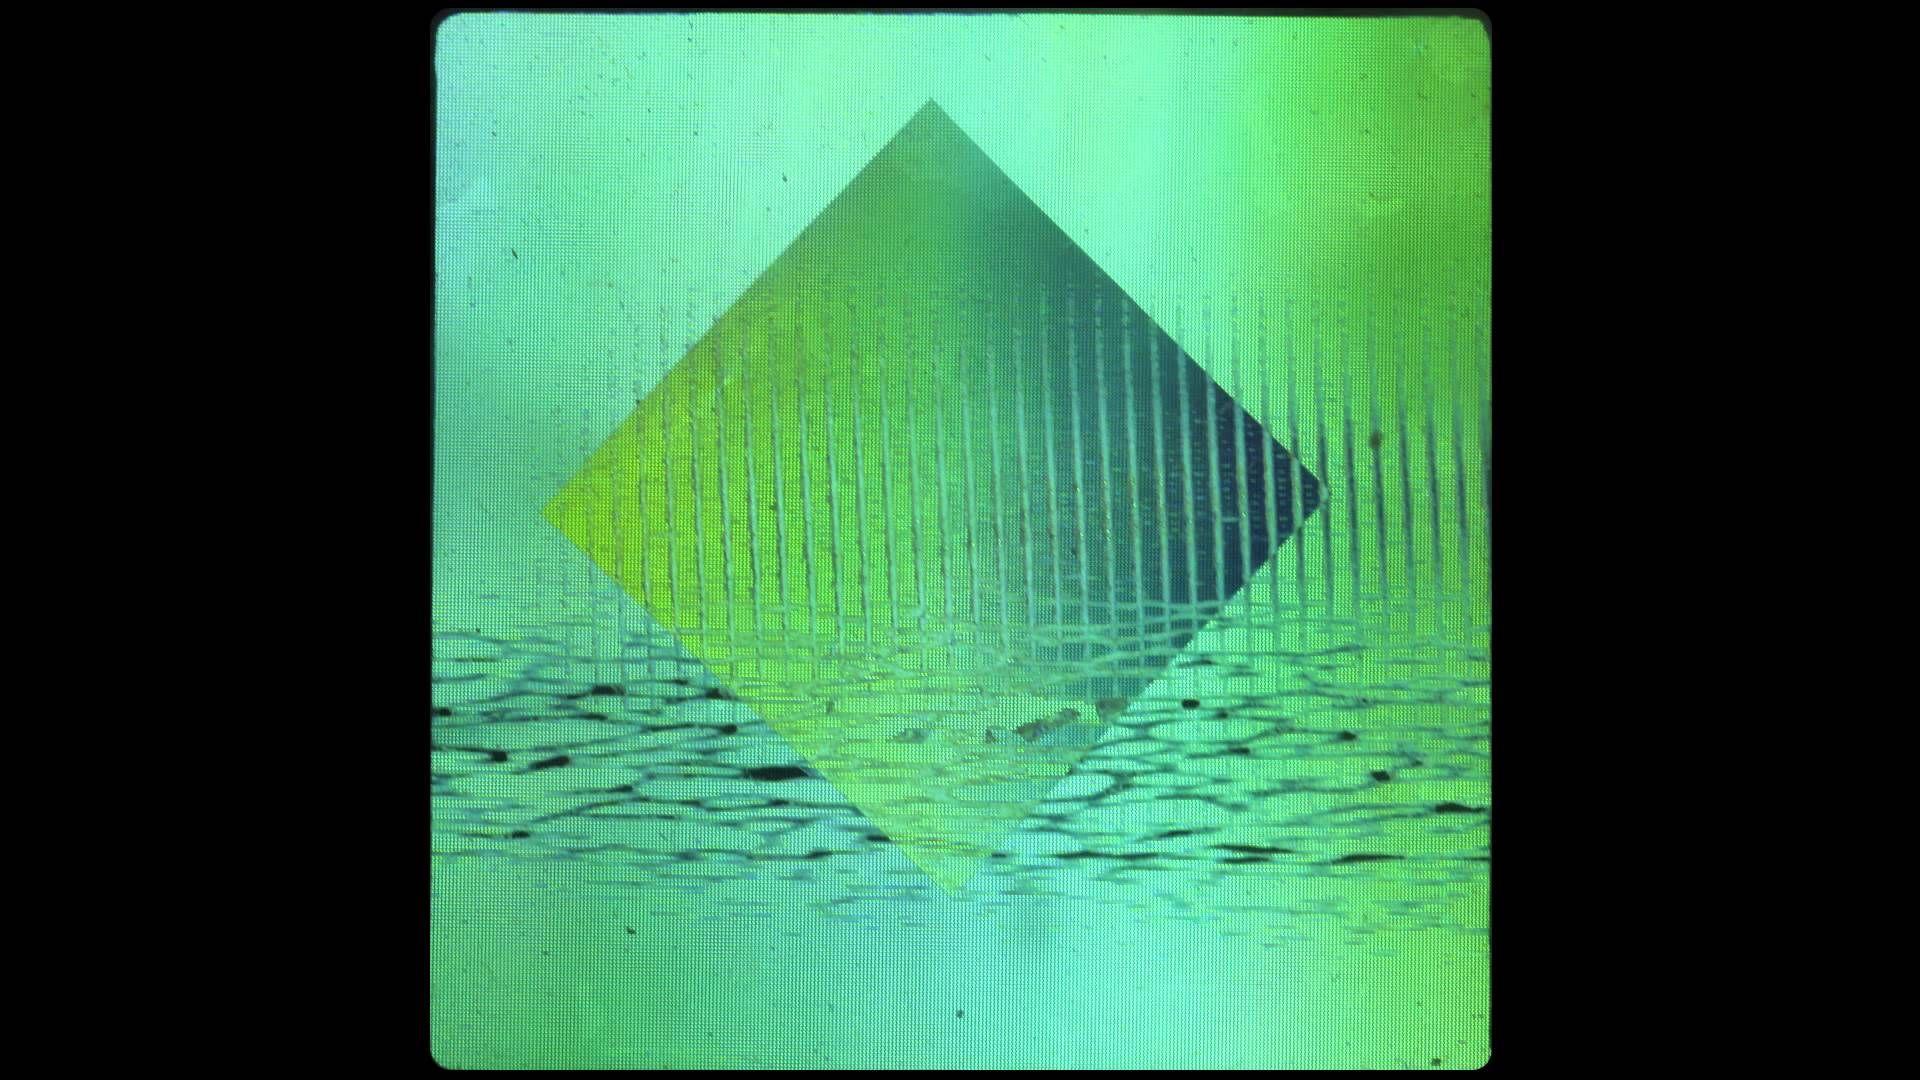 Bruno Munari Illusioni luminose